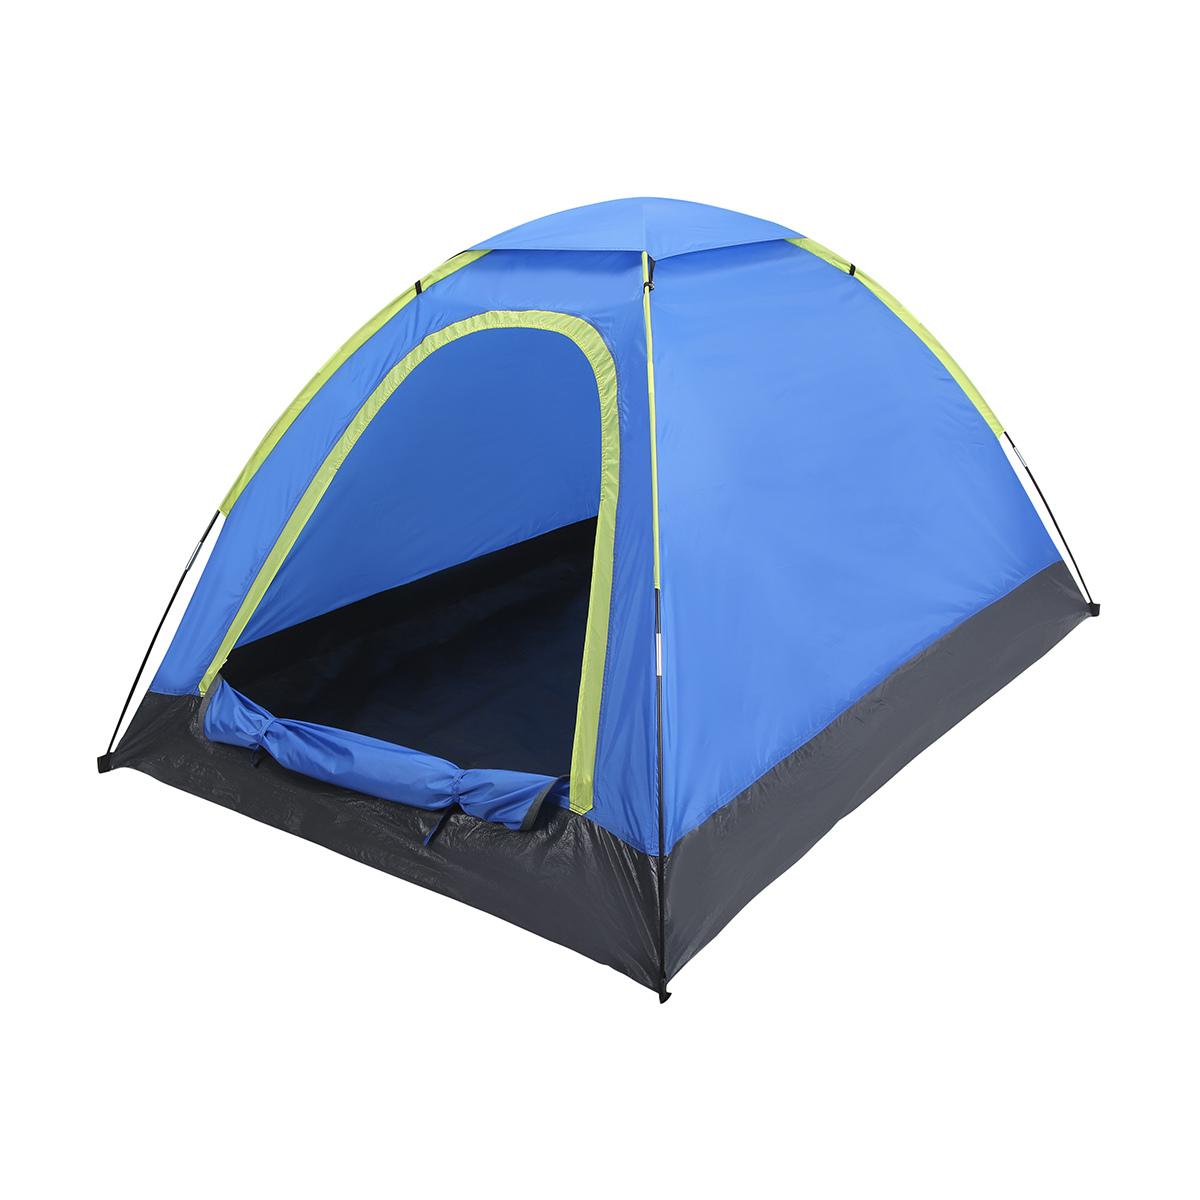 2 Person Dome Tent  sc 1 st  Kmart & Tents u0026 Camping Accessories | Pop Up Tents | Kmart